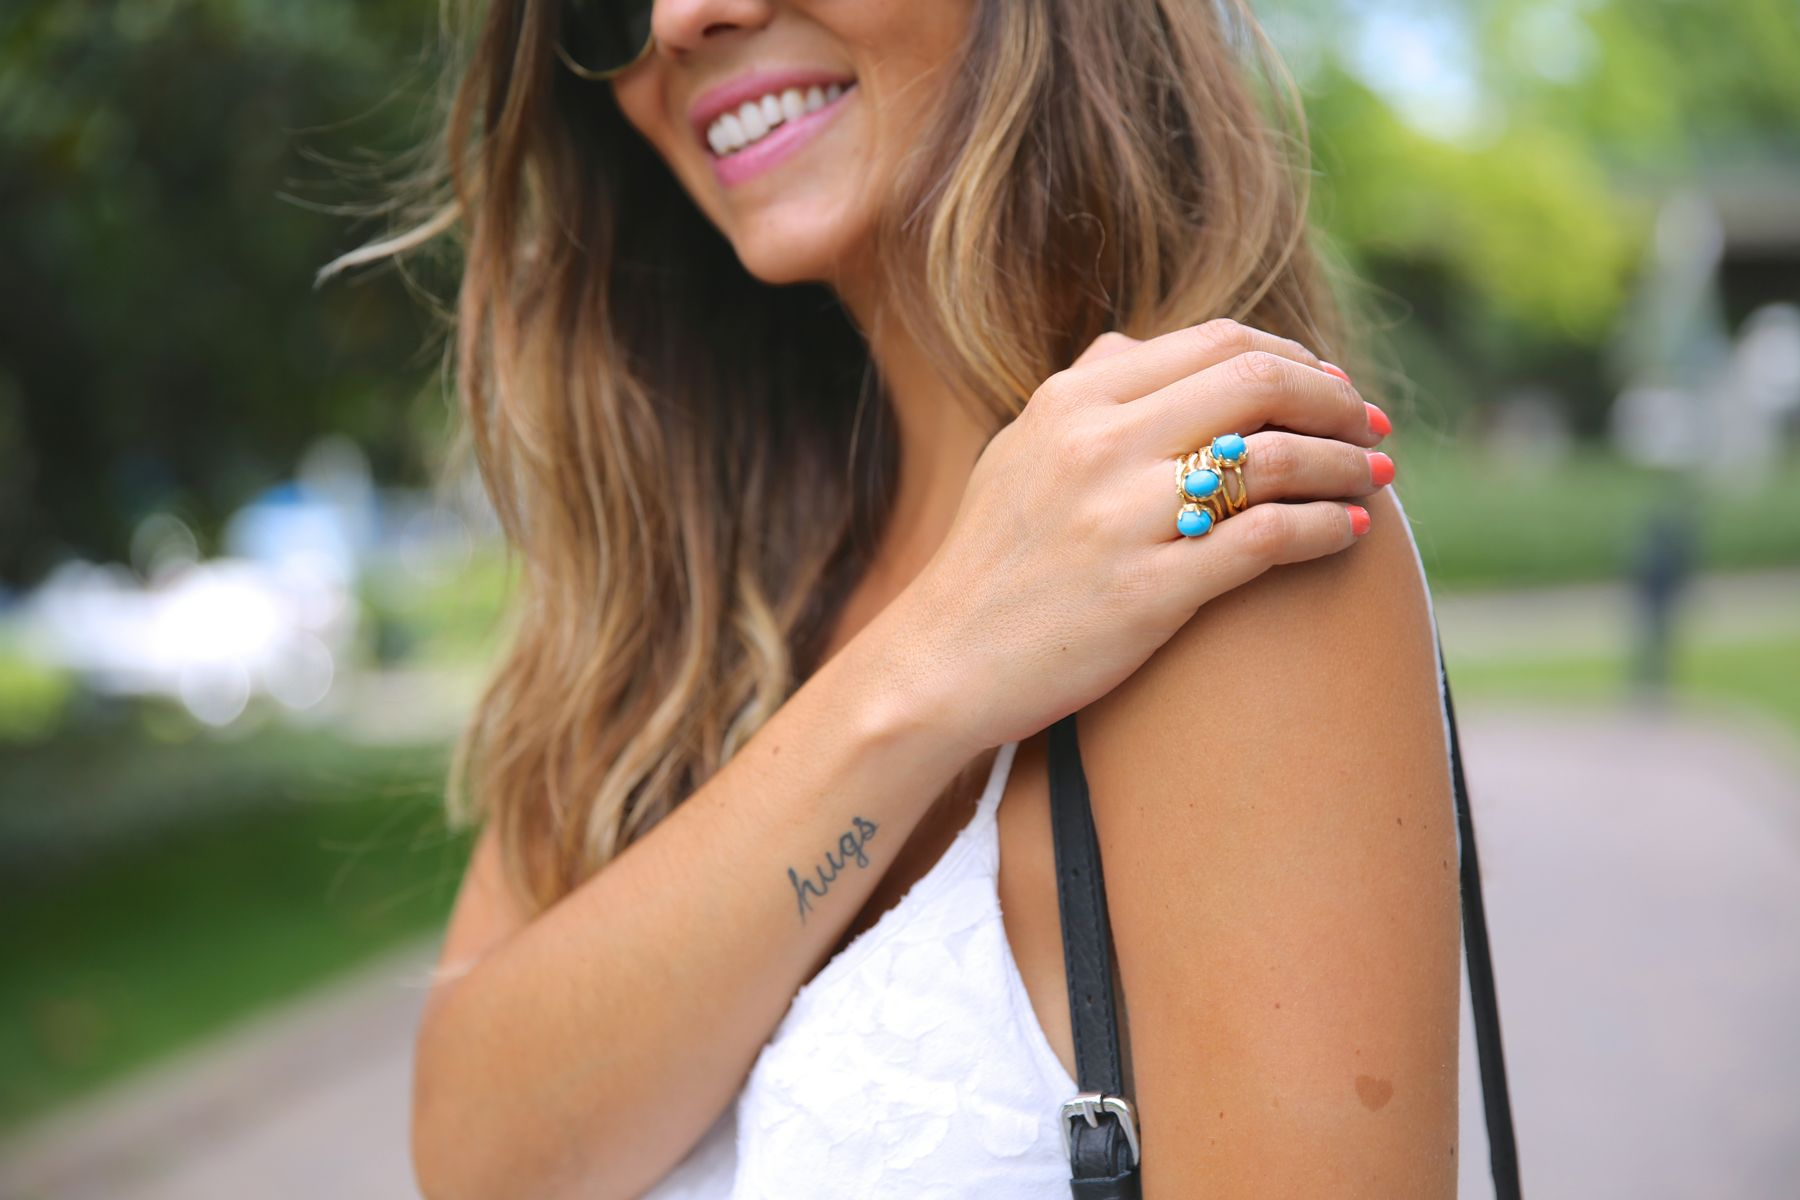 trendy_taste-look-outfit-street_style-ootd-blog-blogger-fashion_spain-moda_españa-fringed_bag-bolso_flecos-sandalias-verano-summer_sandals-ugg_australia-denim_shorts-shorts_vaqueros-oversize-2